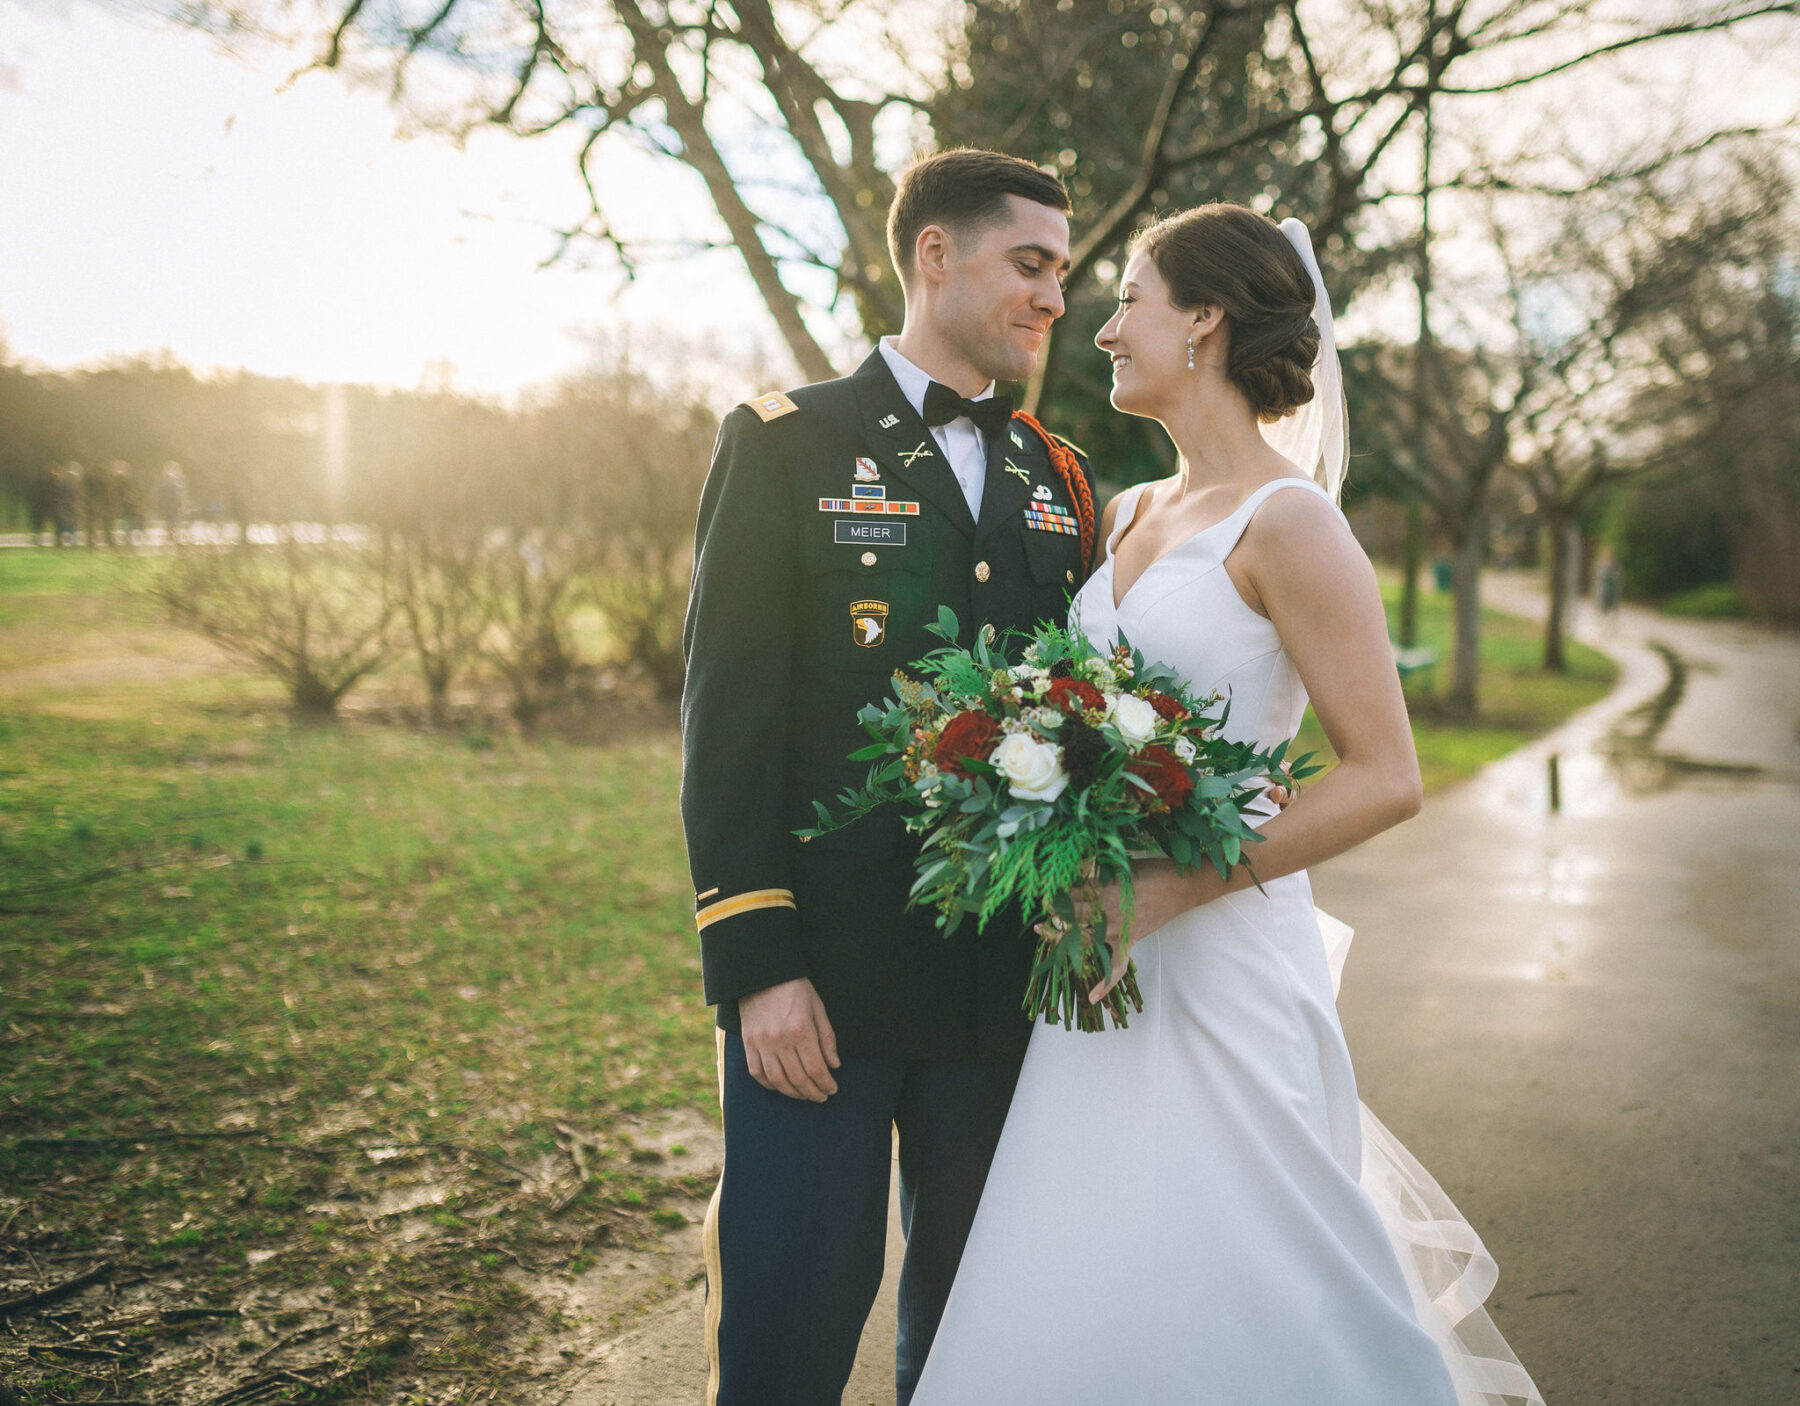 Military Nashville wedding featured on Nashville Bride Guide